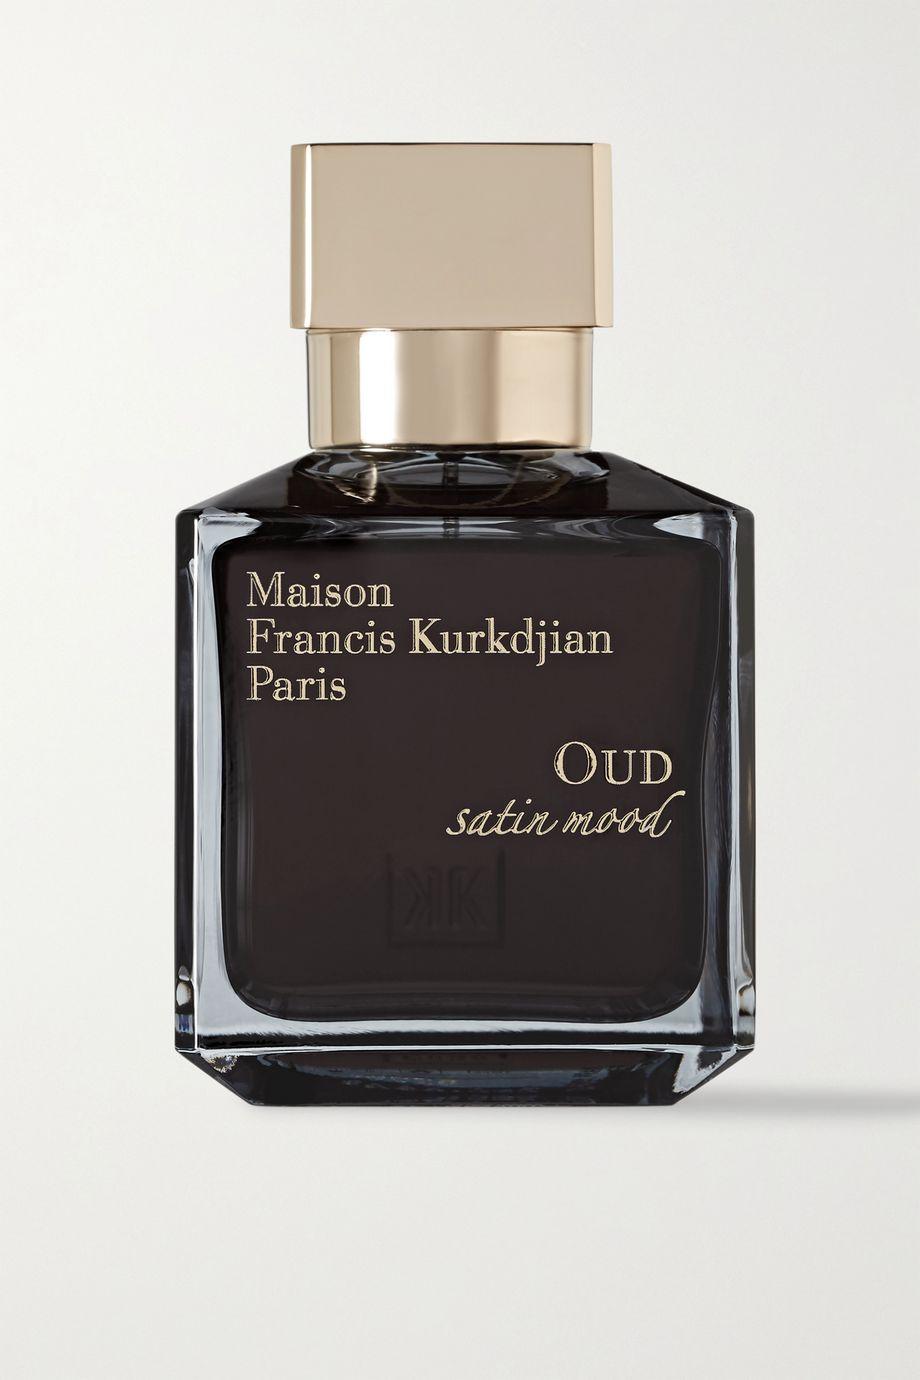 Maison Francis Kurkdjian Oud Satin Mood Eau de Parfum - Oud & Patchouli, 70ml